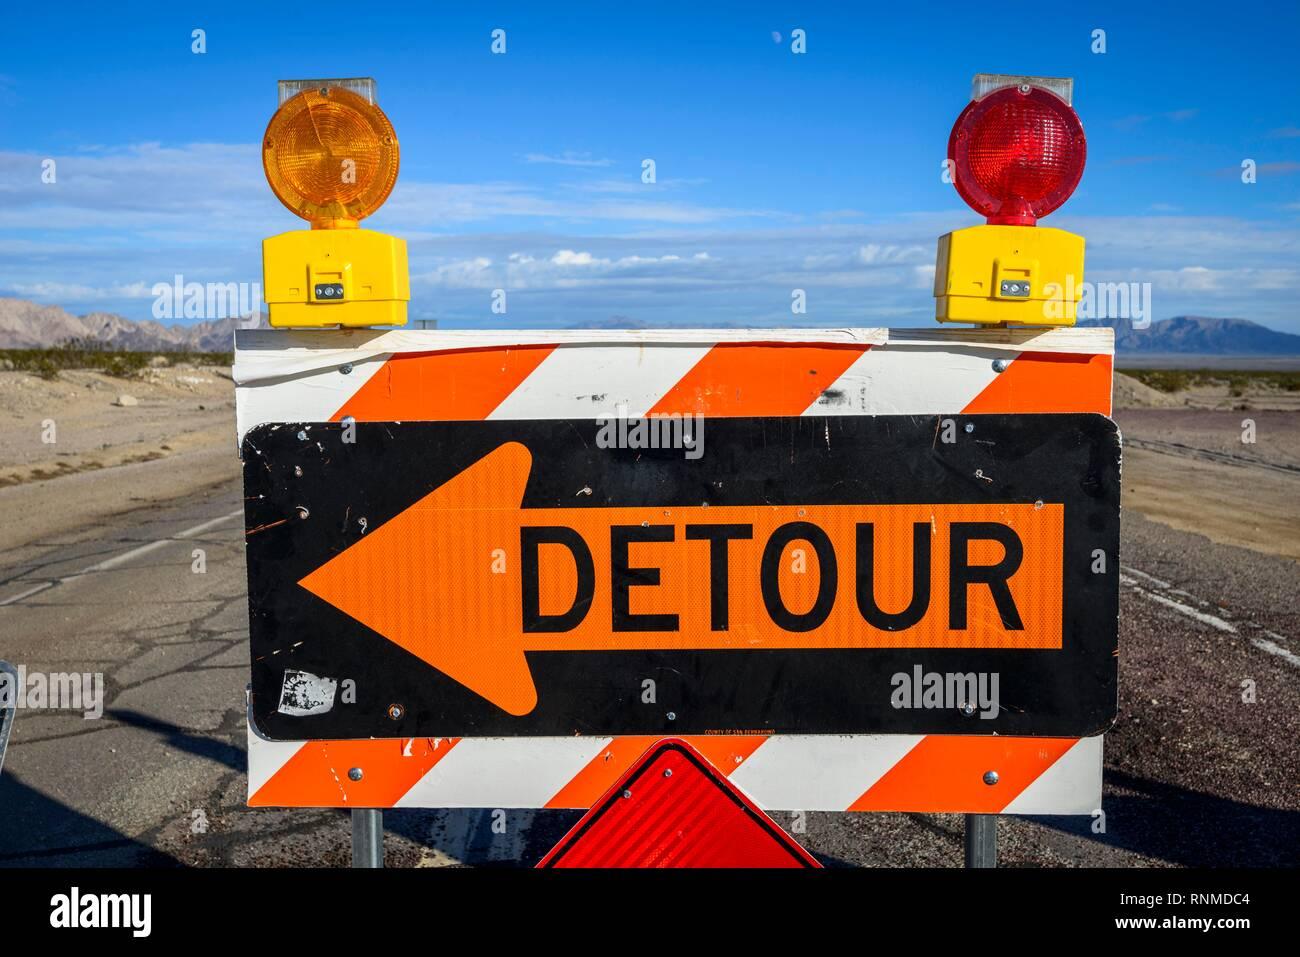 Road sign, Detour, roadblock with detour, Historic Route 66, Ludlow, California, USA - Stock Image